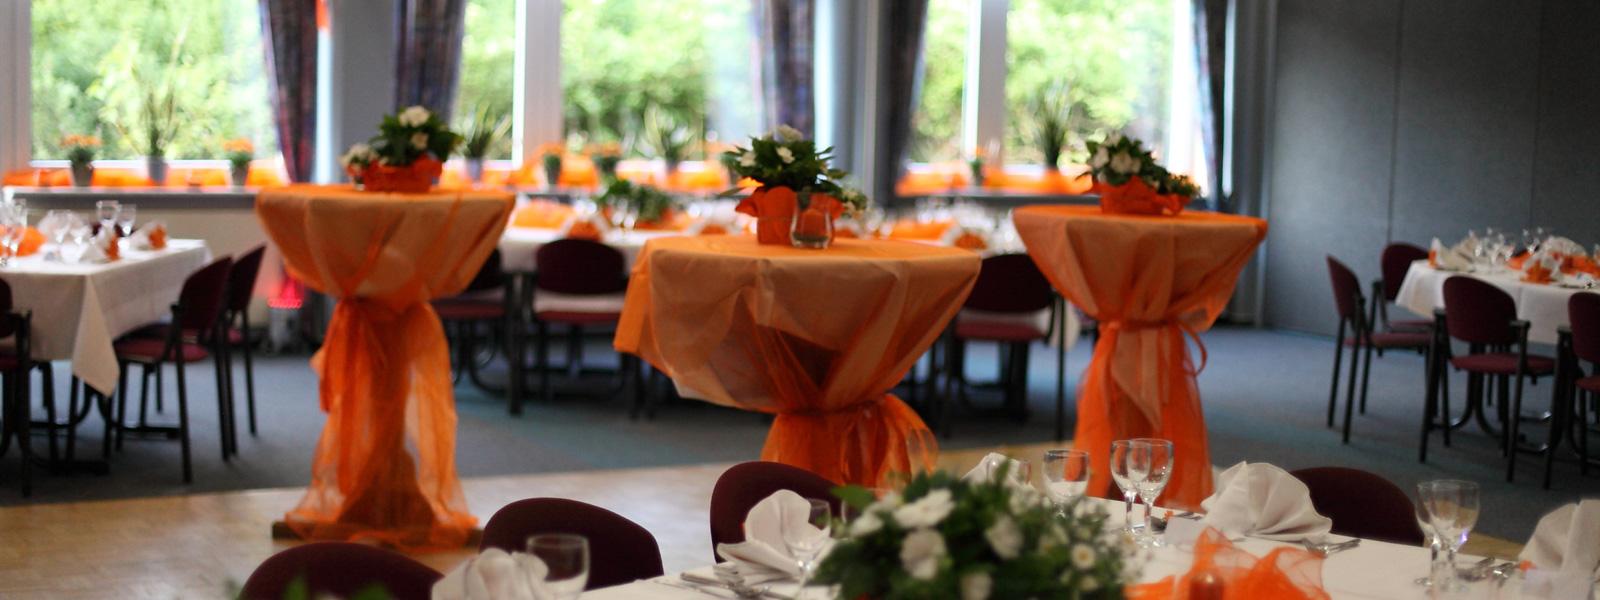 Hotel Restaurant Cafe Stimbergpark Oer Erkenschwick